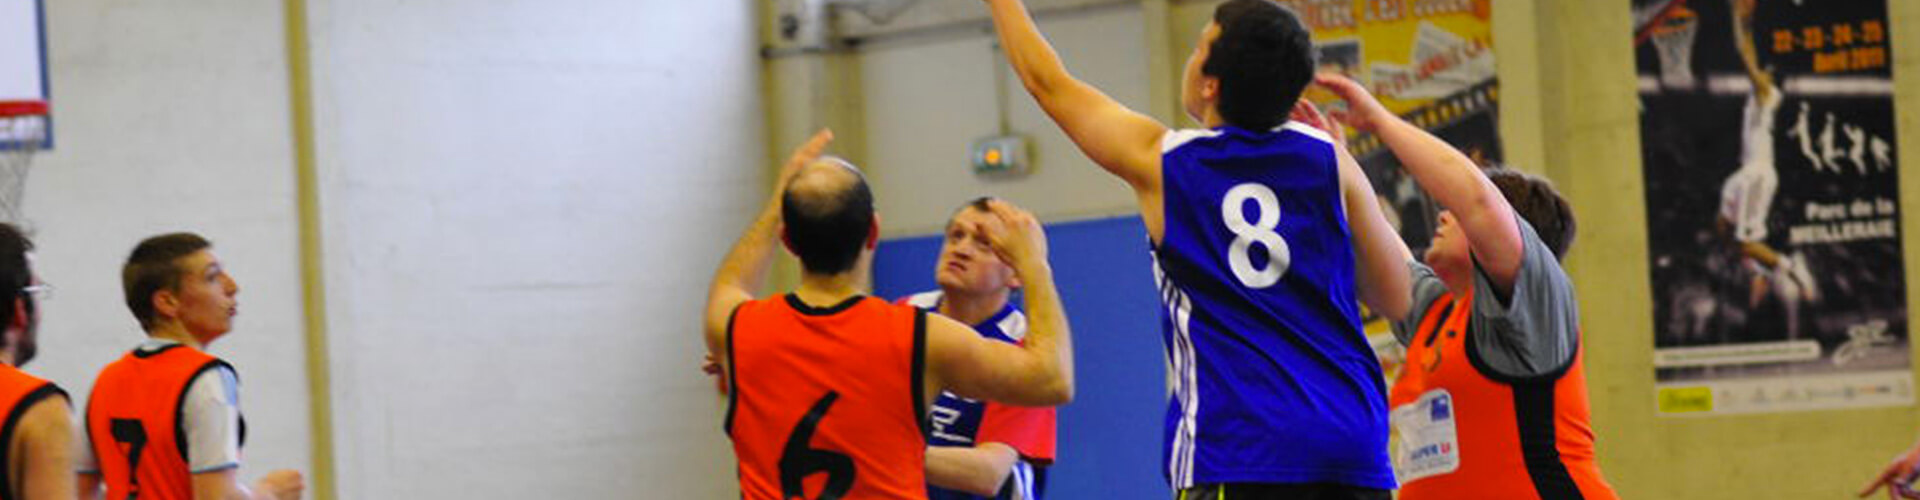 sports-loisirs-adaptes-jeune-france-cholet